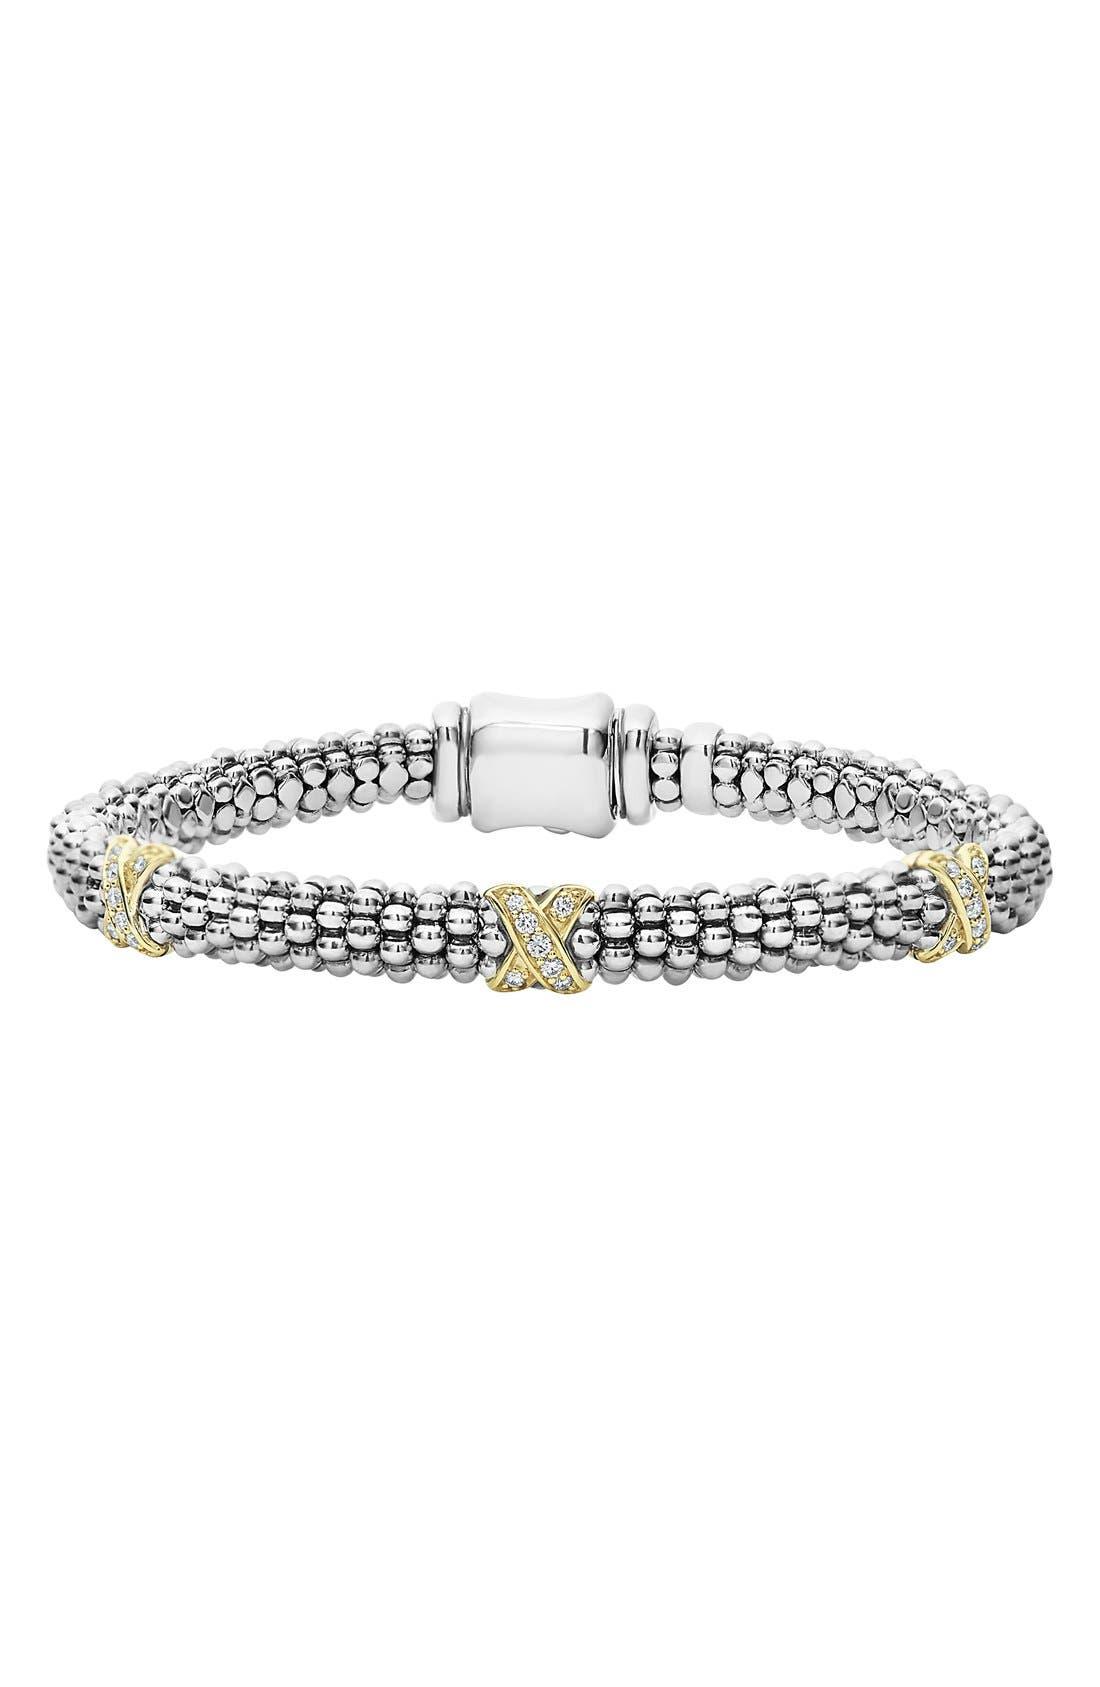 'Signature Caviar' Diamond Rope Bracelet,                             Main thumbnail 1, color,                             SILVER/ GOLD